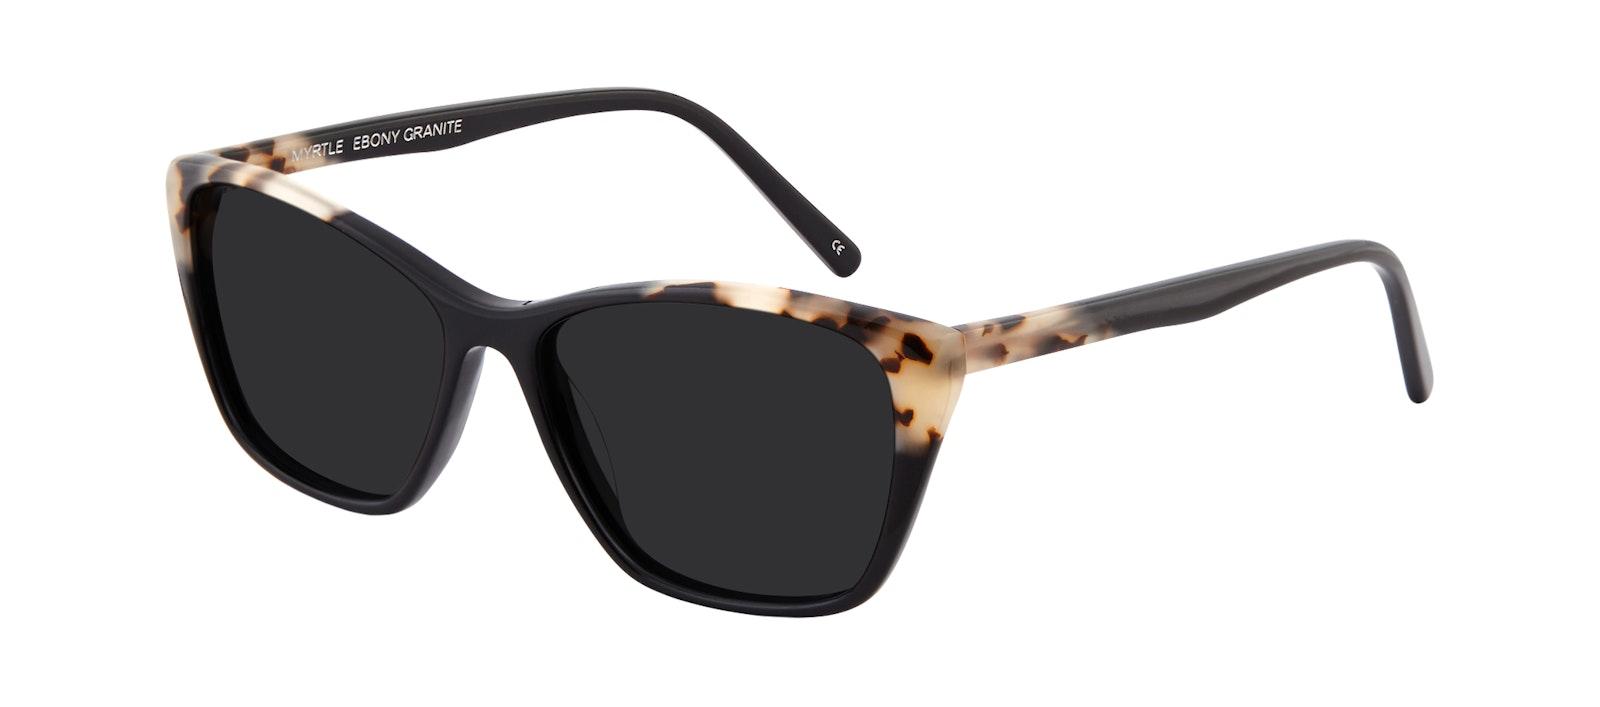 Affordable Fashion Glasses Cat Eye Rectangle Sunglasses Women Myrtle Ebony Granite Tilt